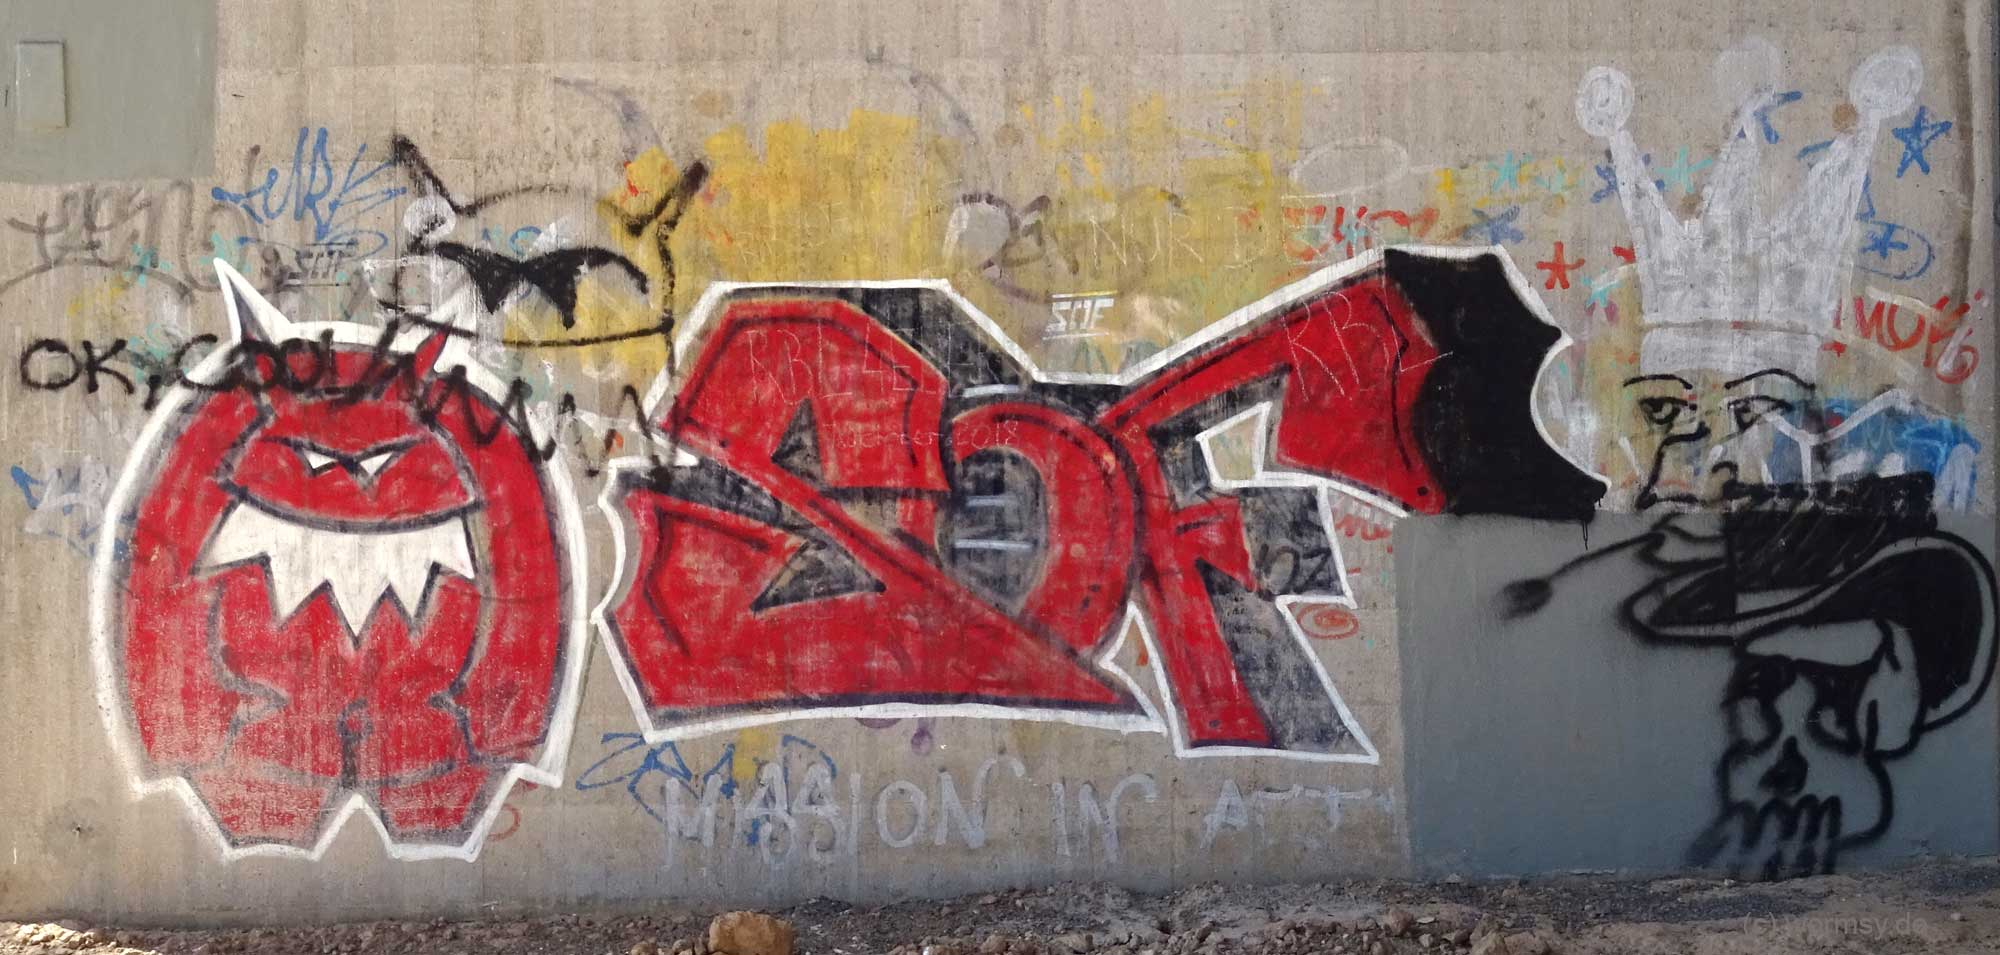 Graffiti unter der Talbrücke Worms-Pfeddersheim - SOF